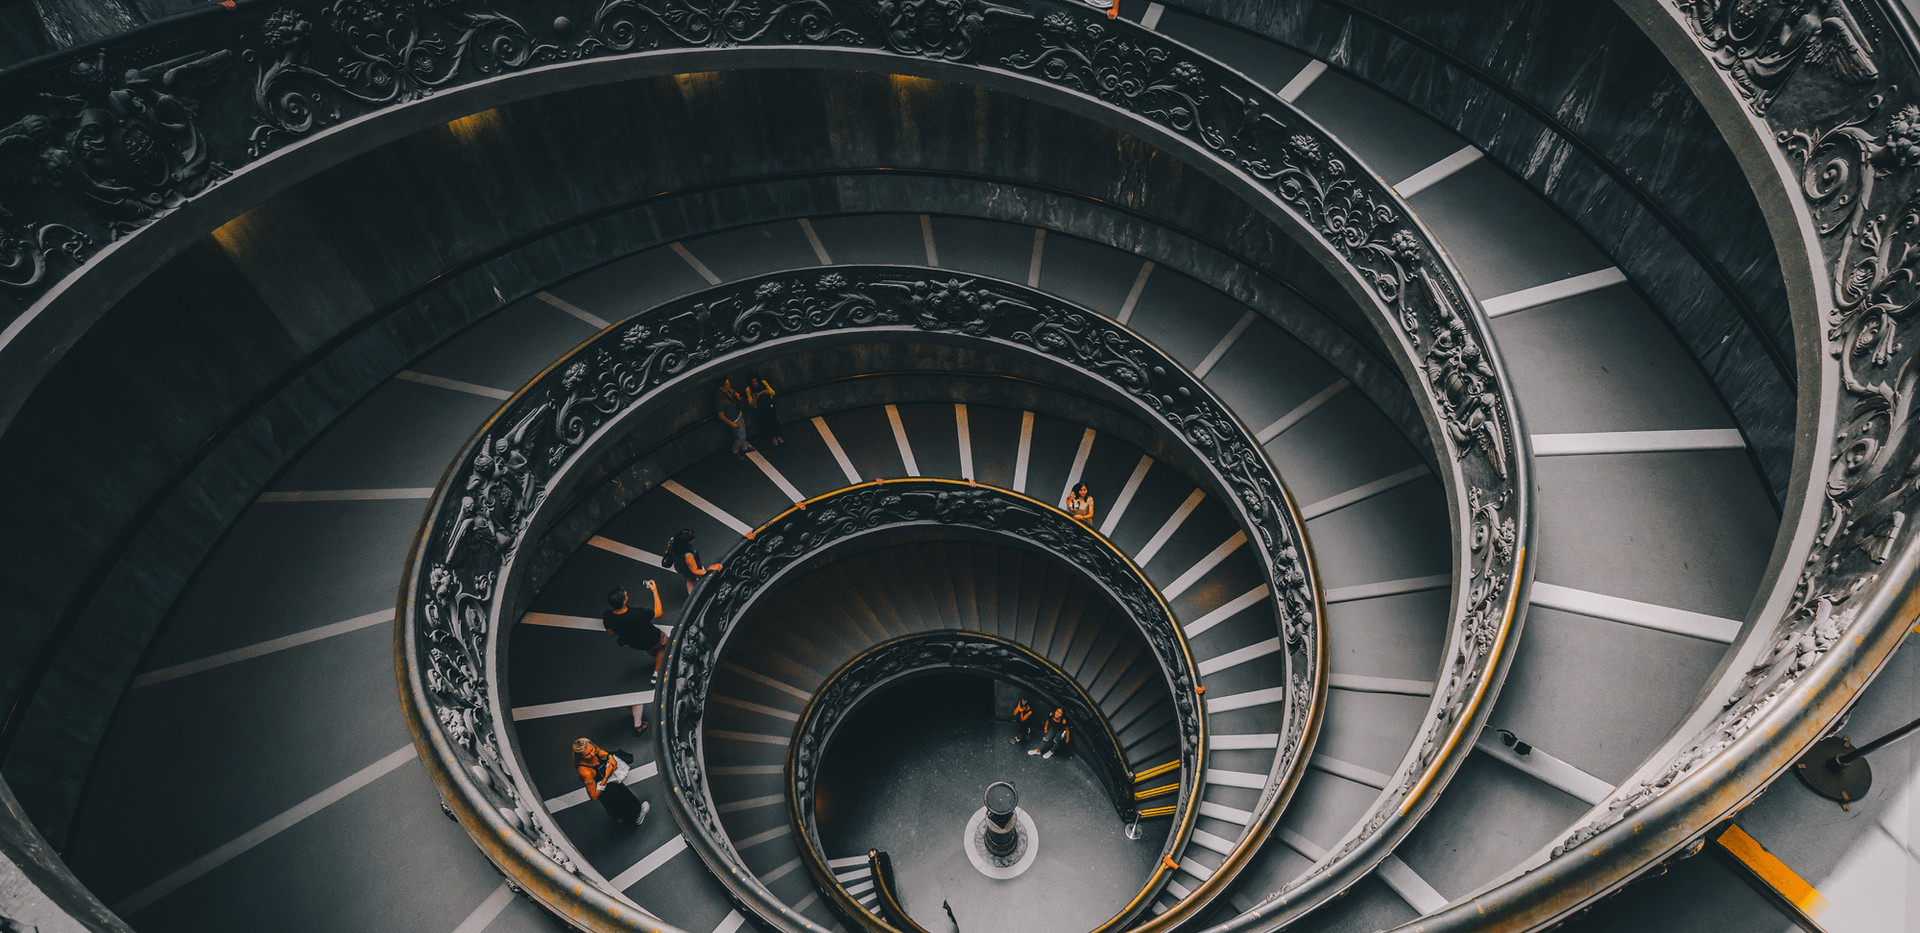 Führung Vatikan ohne Anstehen: Vatikanische Museen, Sixtinische Kapelle & Petersdom